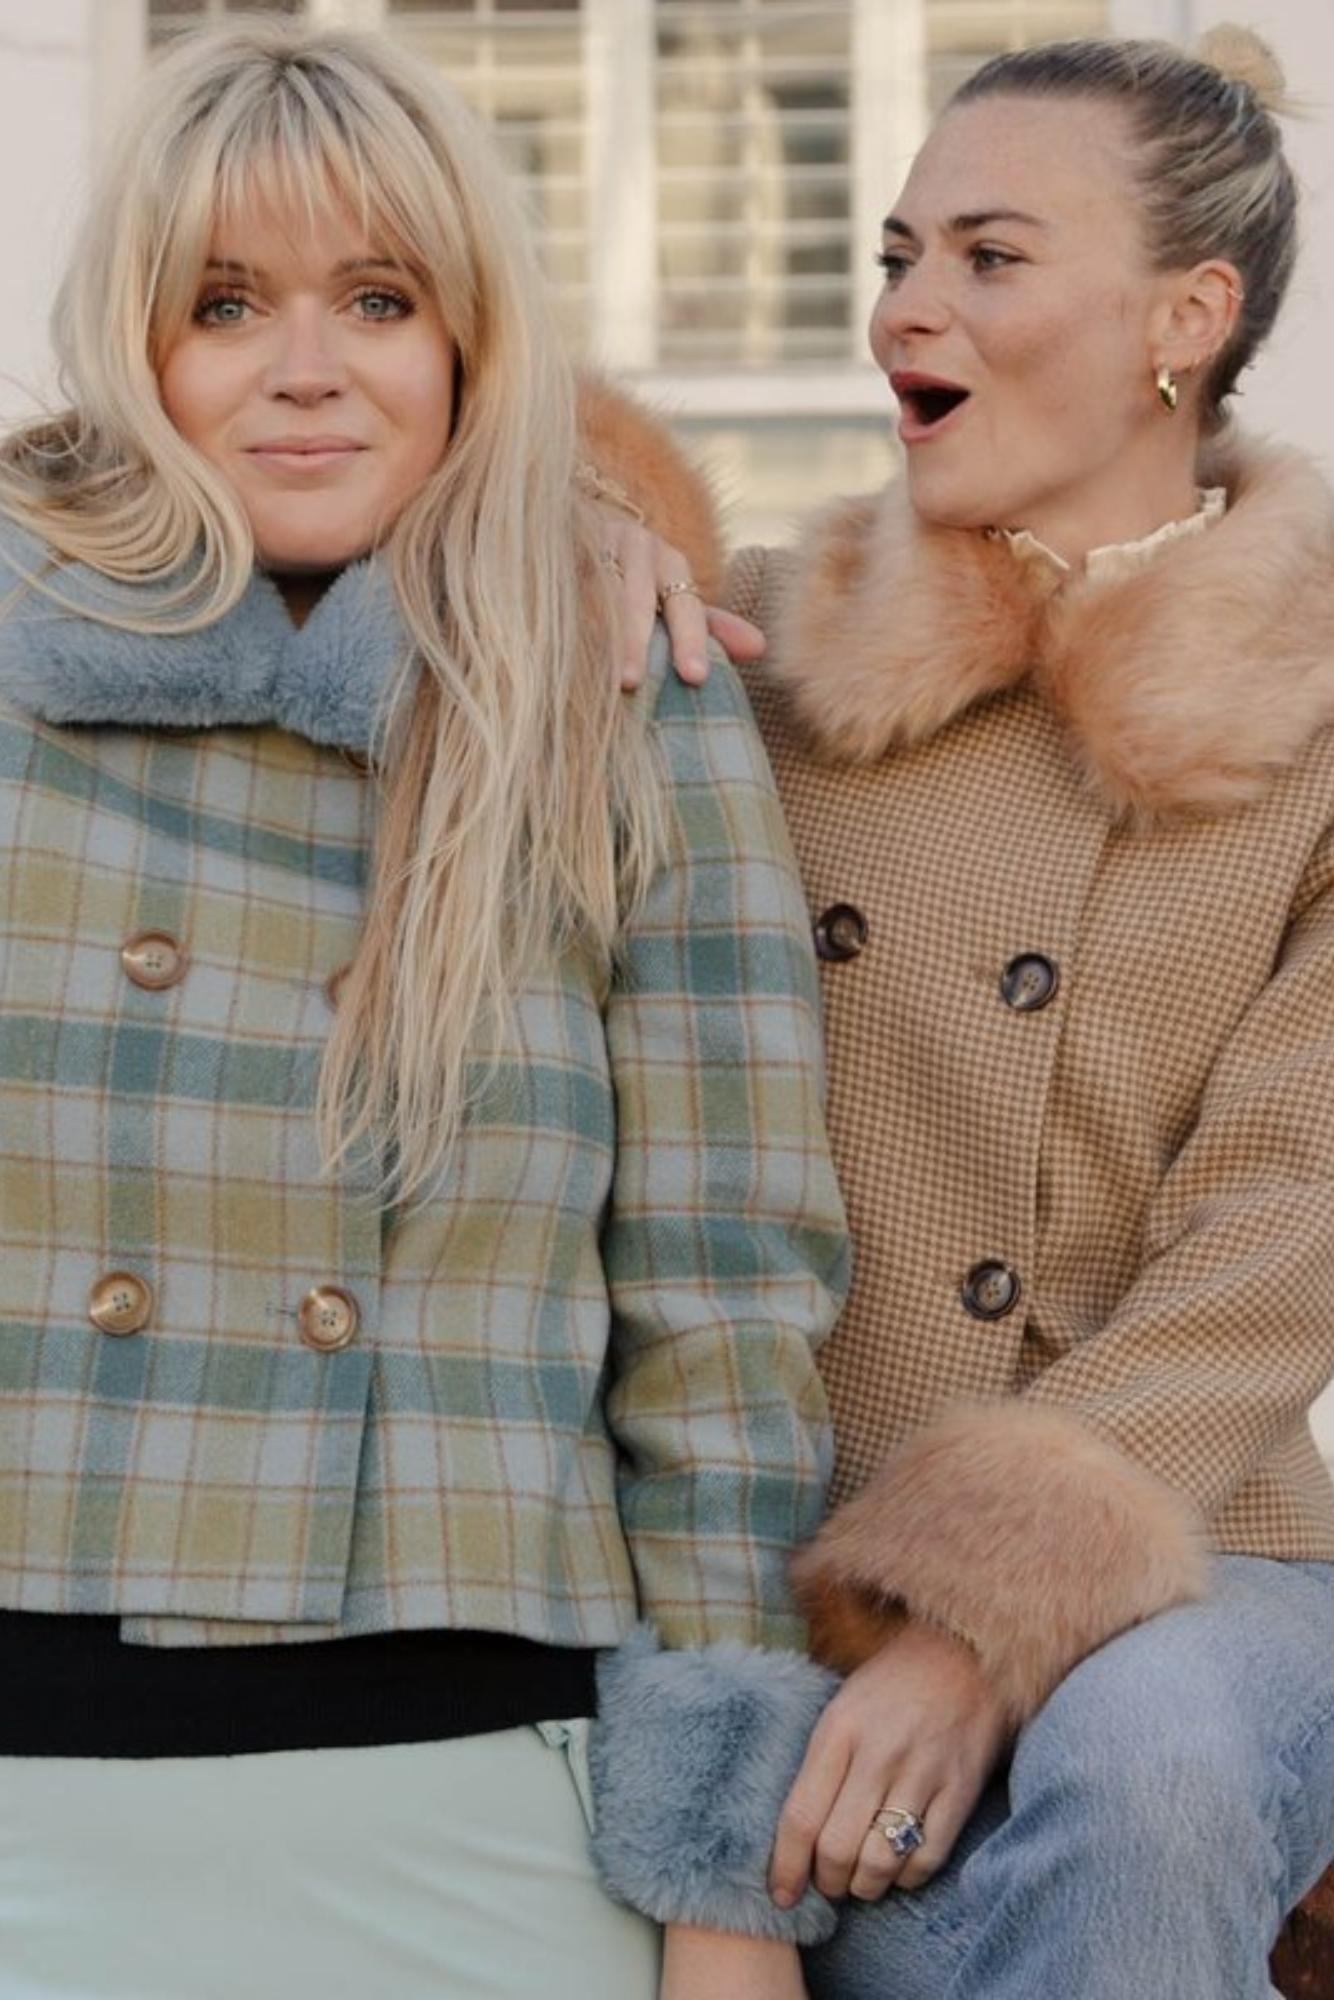 The High Low Dolly Alderton and Pandora Sykes